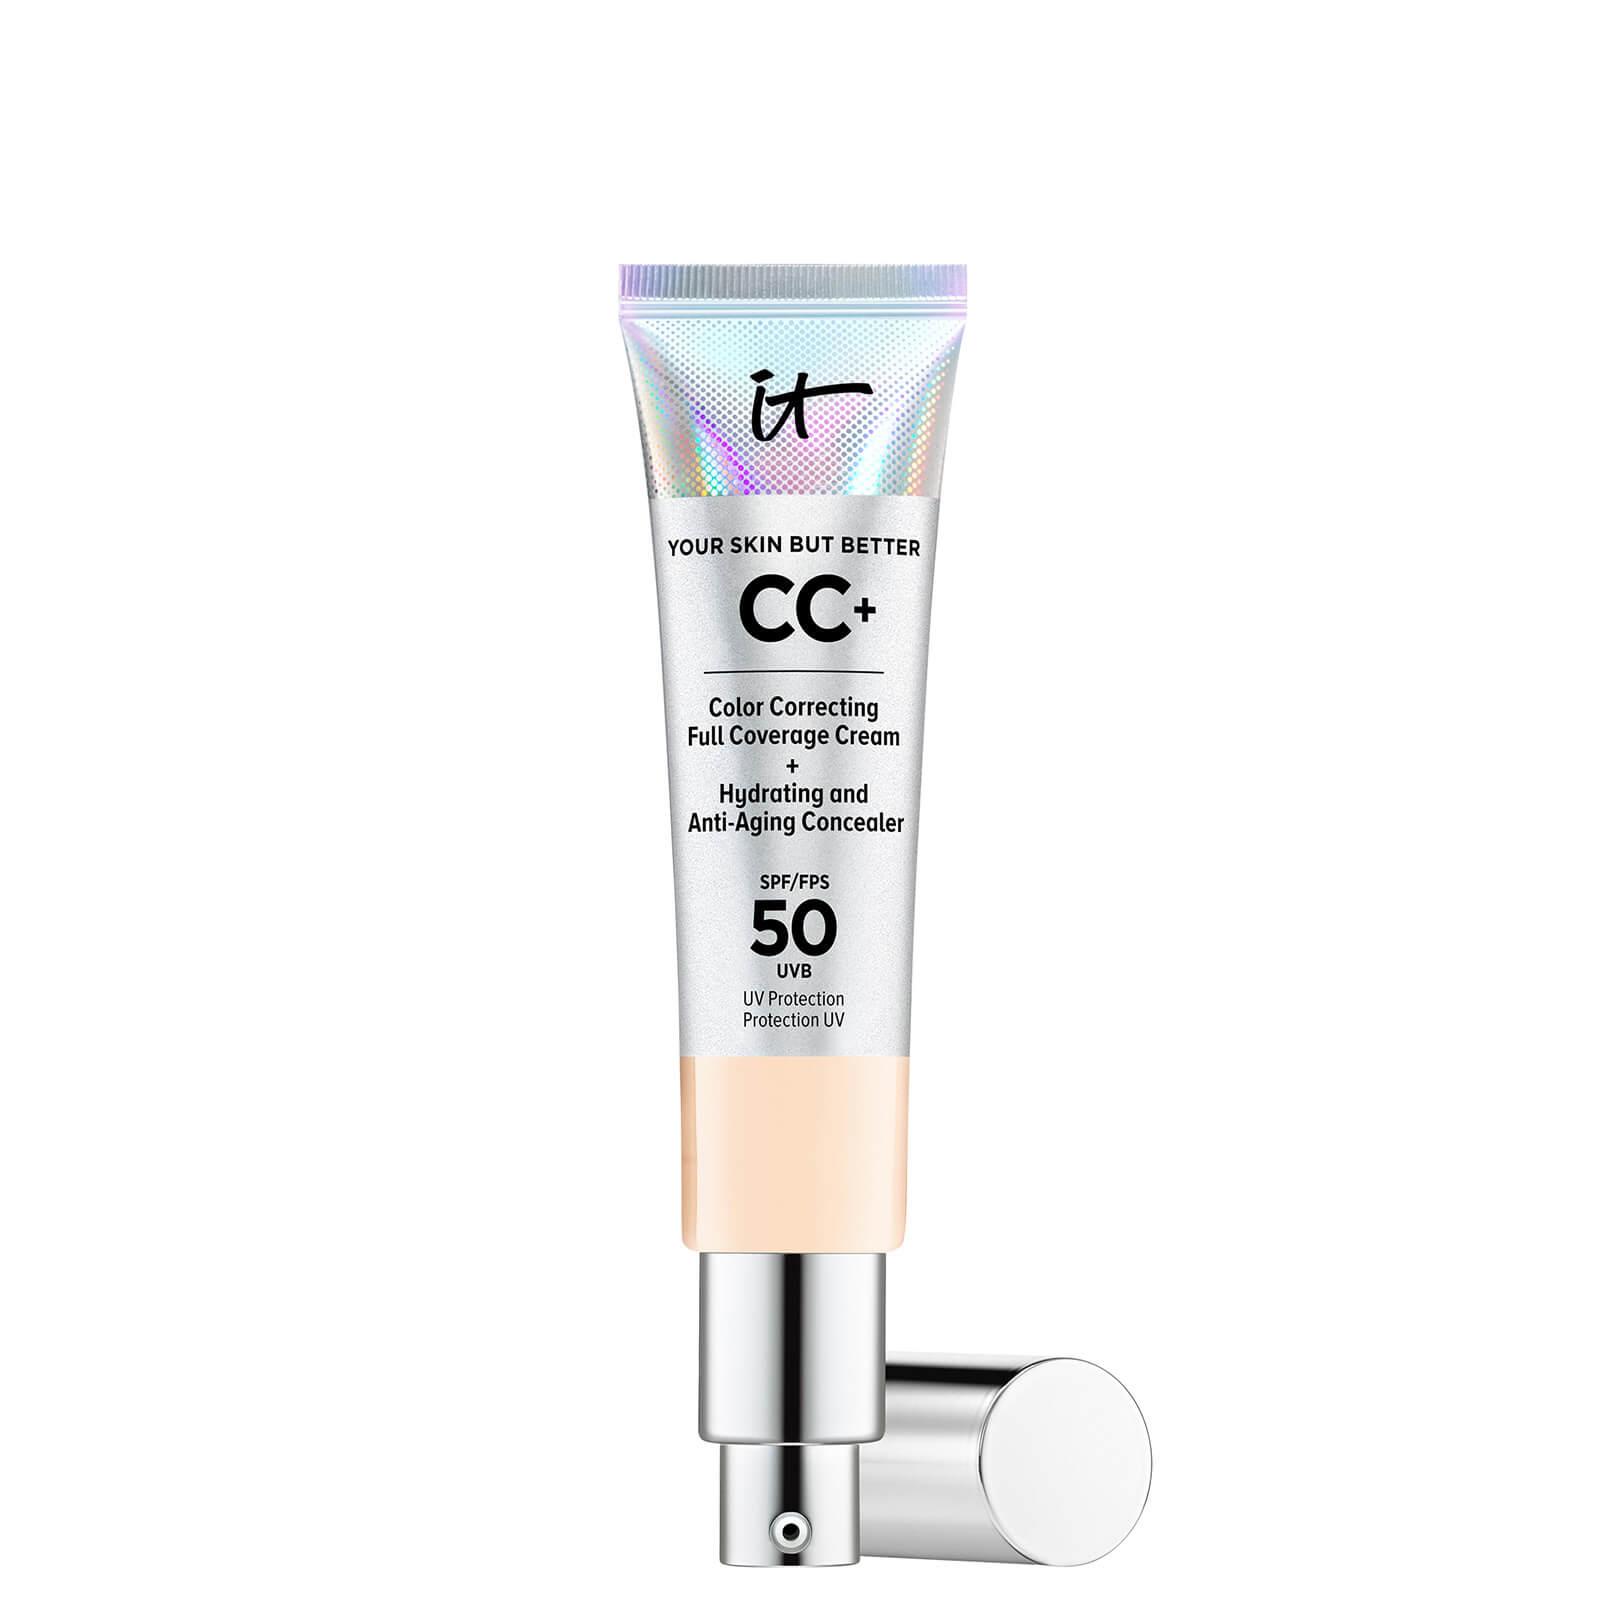 Купить IT Cosmetics Your Skin But Better CC+ Cream with SPF50 32ml (Various Shades) - Fair-Light